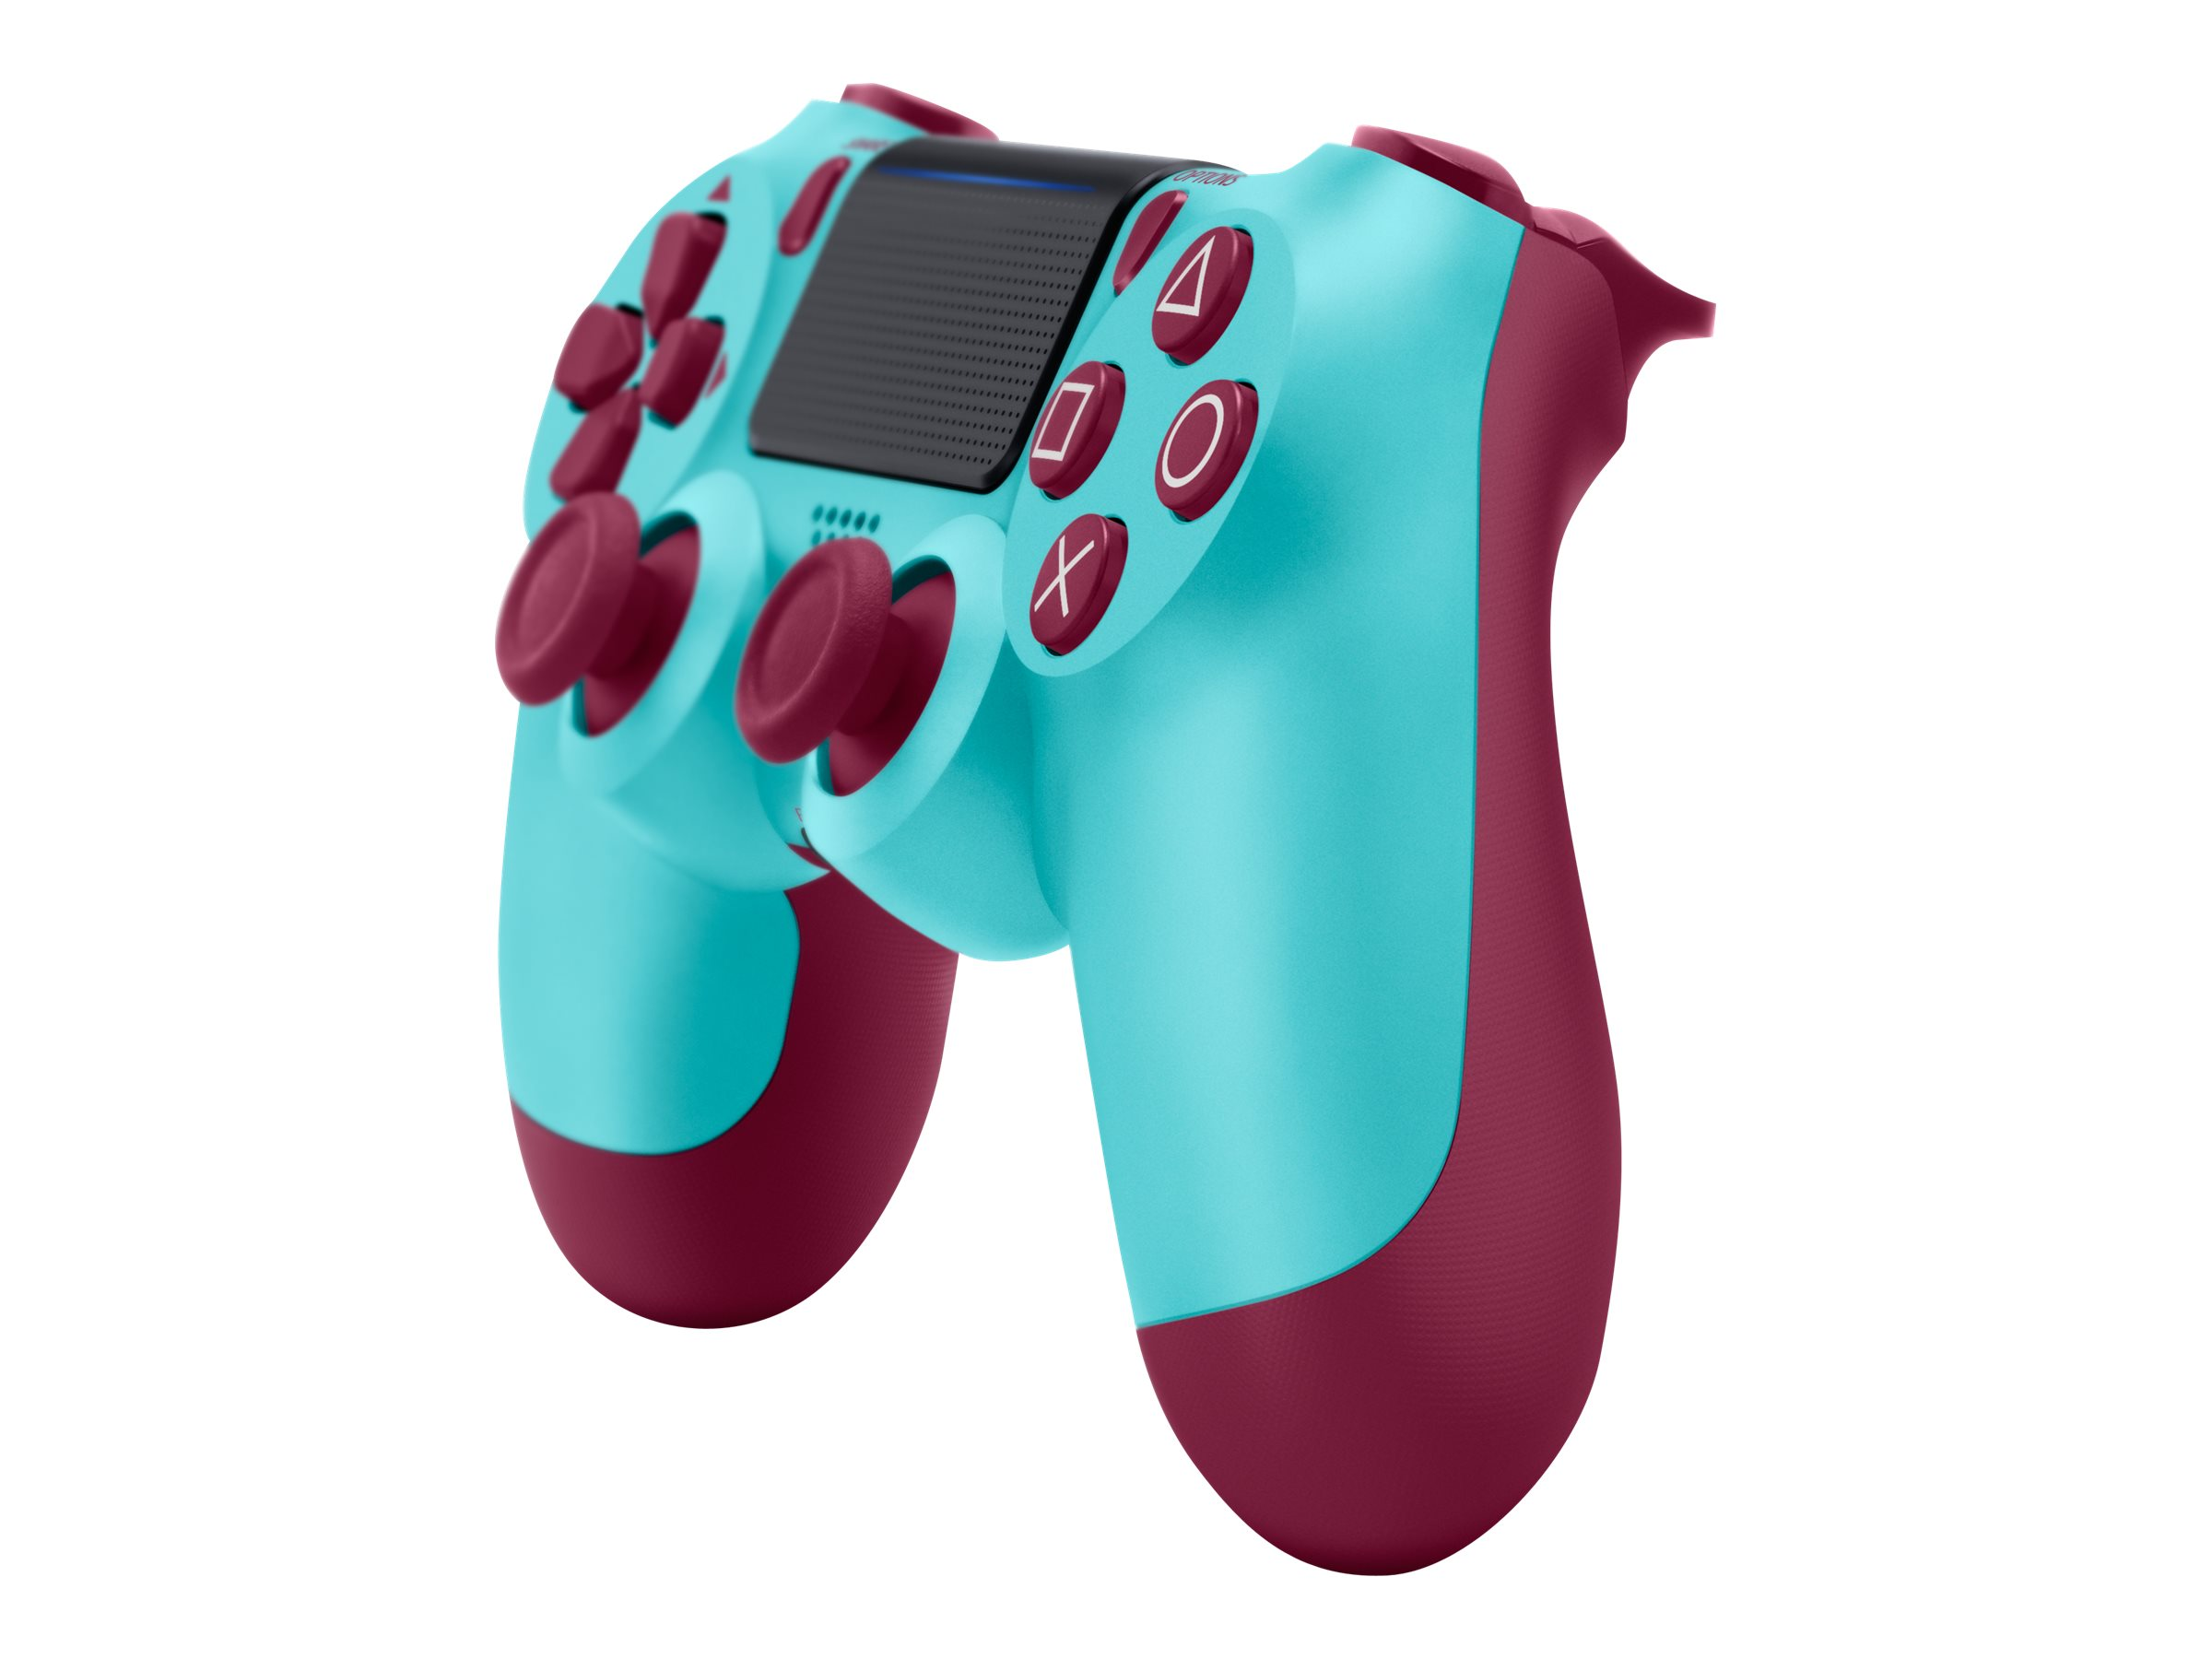 Sony DualShock 4 - Game Pad - kabellos - Bluetooth - Berry Blue - für Sony PlayStation 4